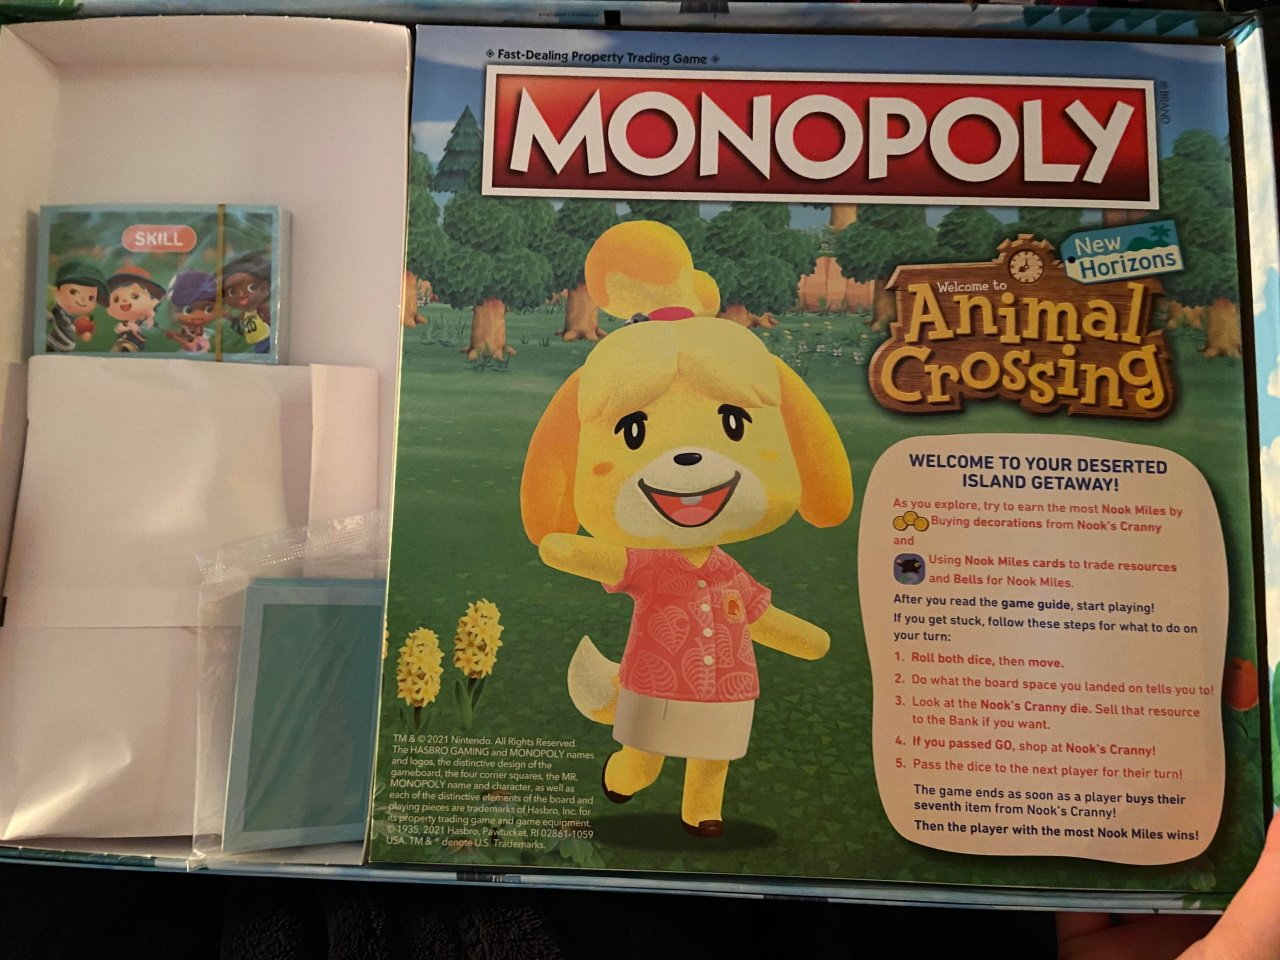 Animal crossing monopoly game box minis